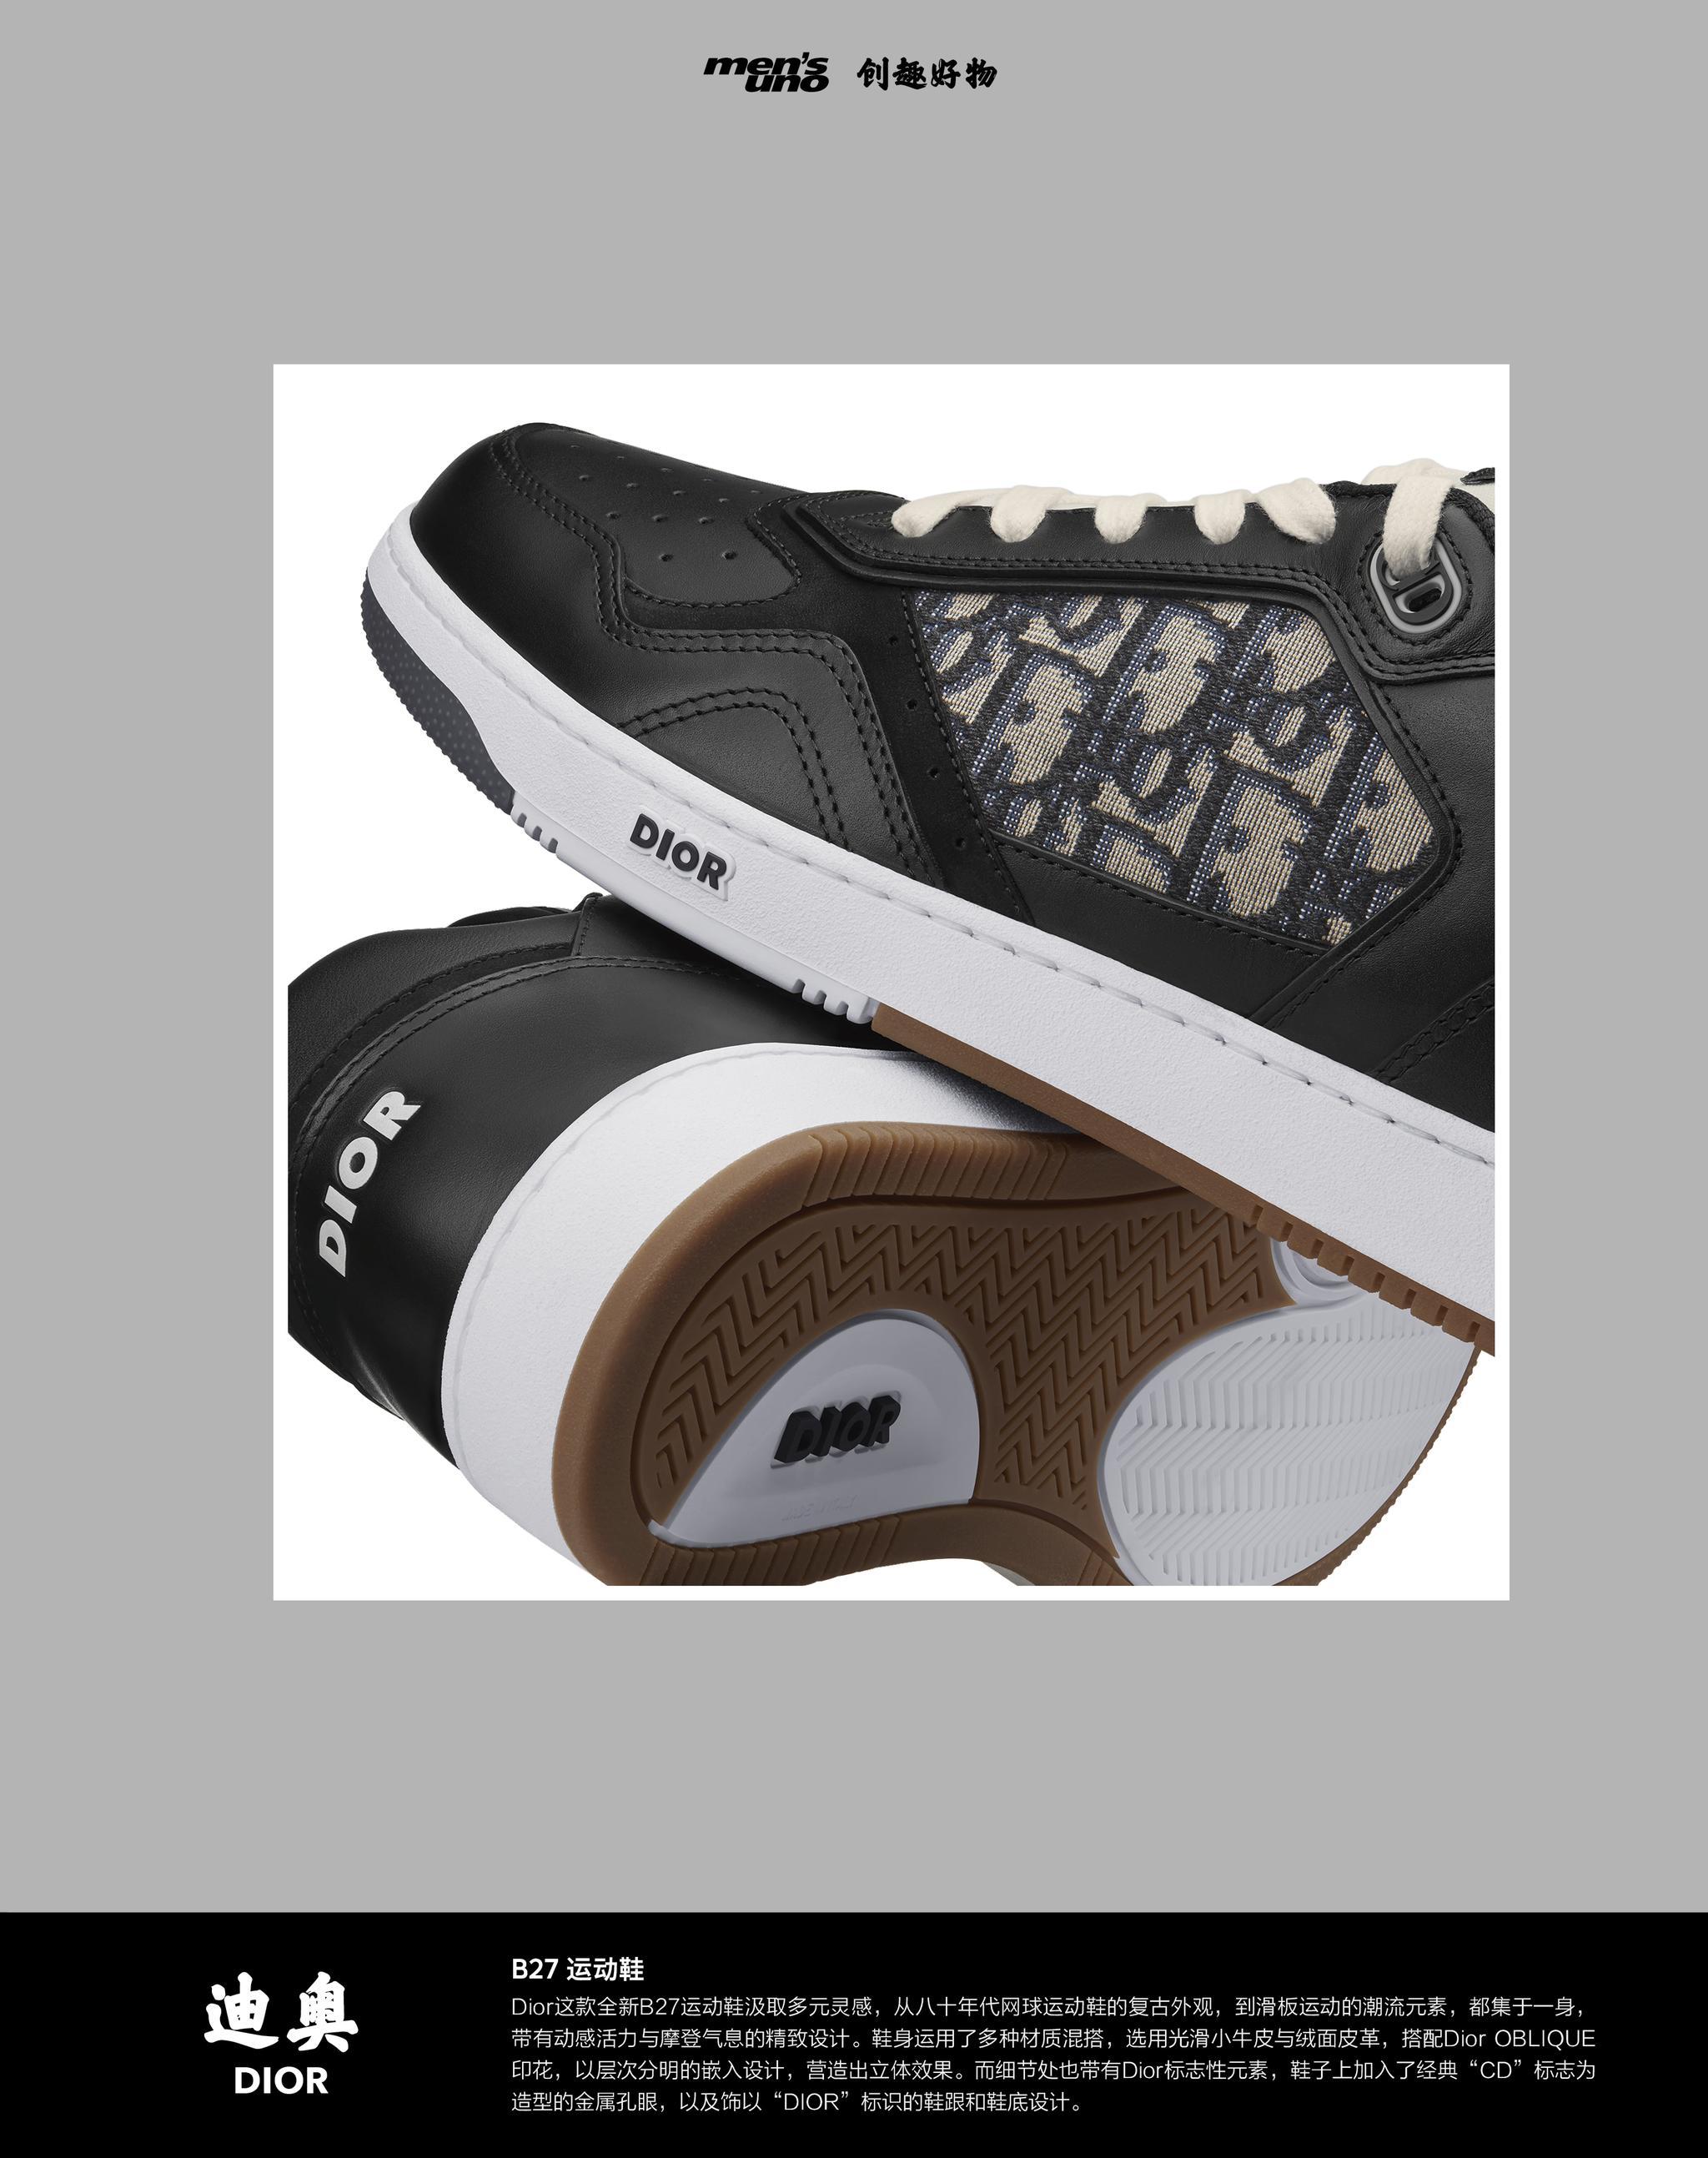 Dior这款全新B27运动鞋汲取多元灵感……